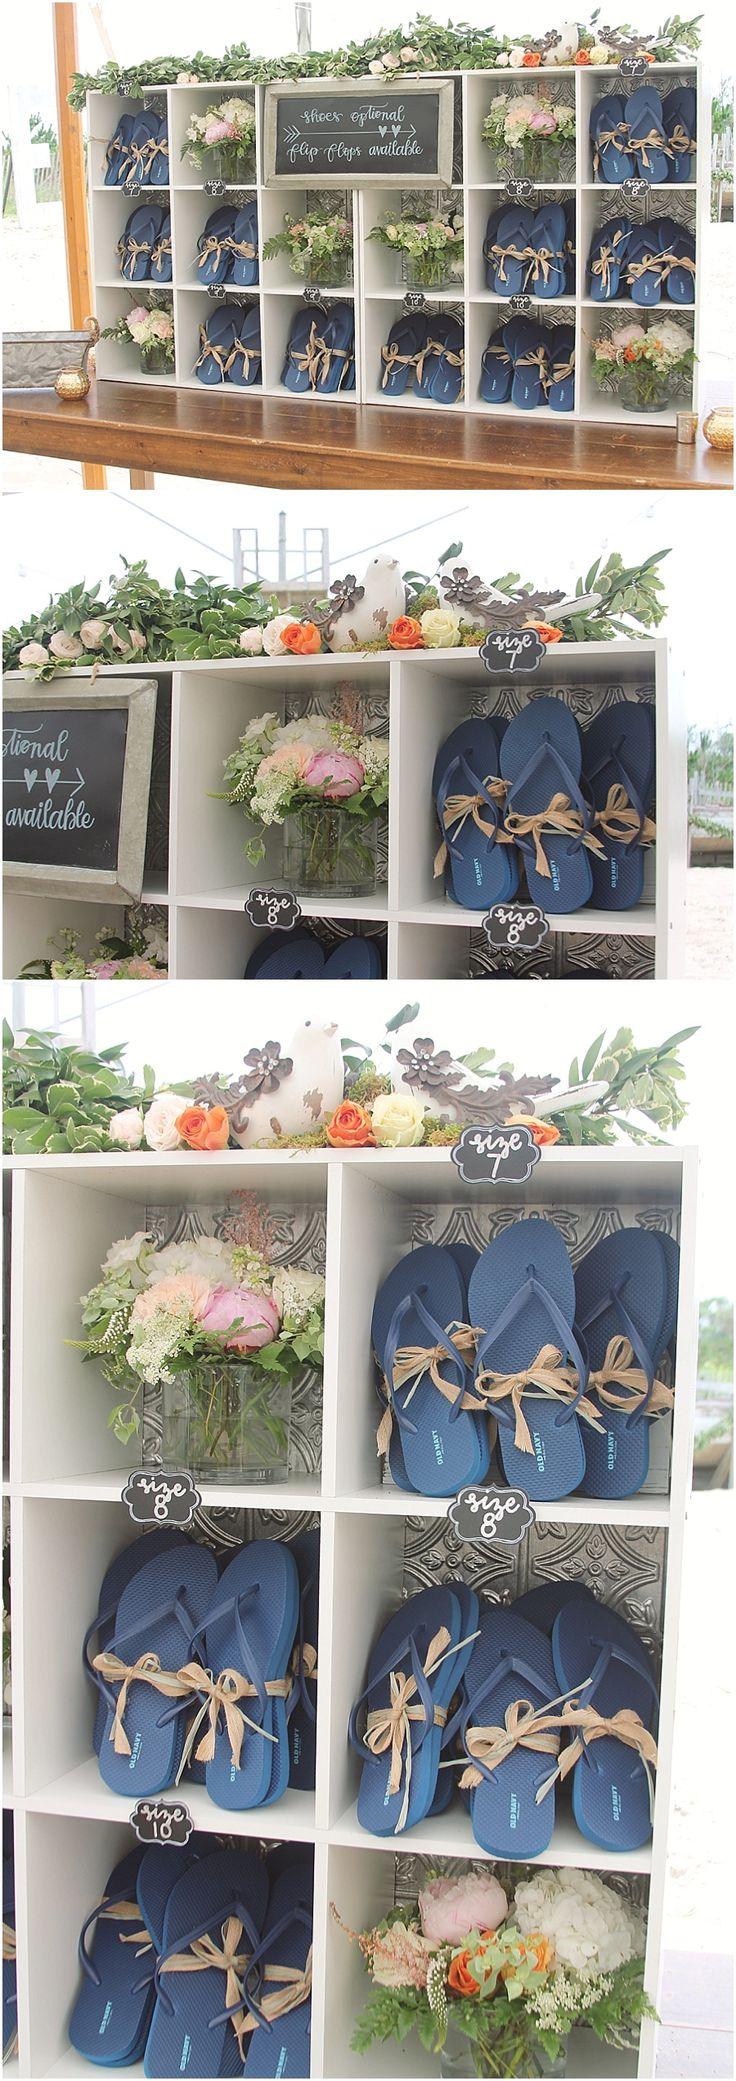 little miss lovely floral design // rehoboth beach de wedding // flip flop station for beach wedding